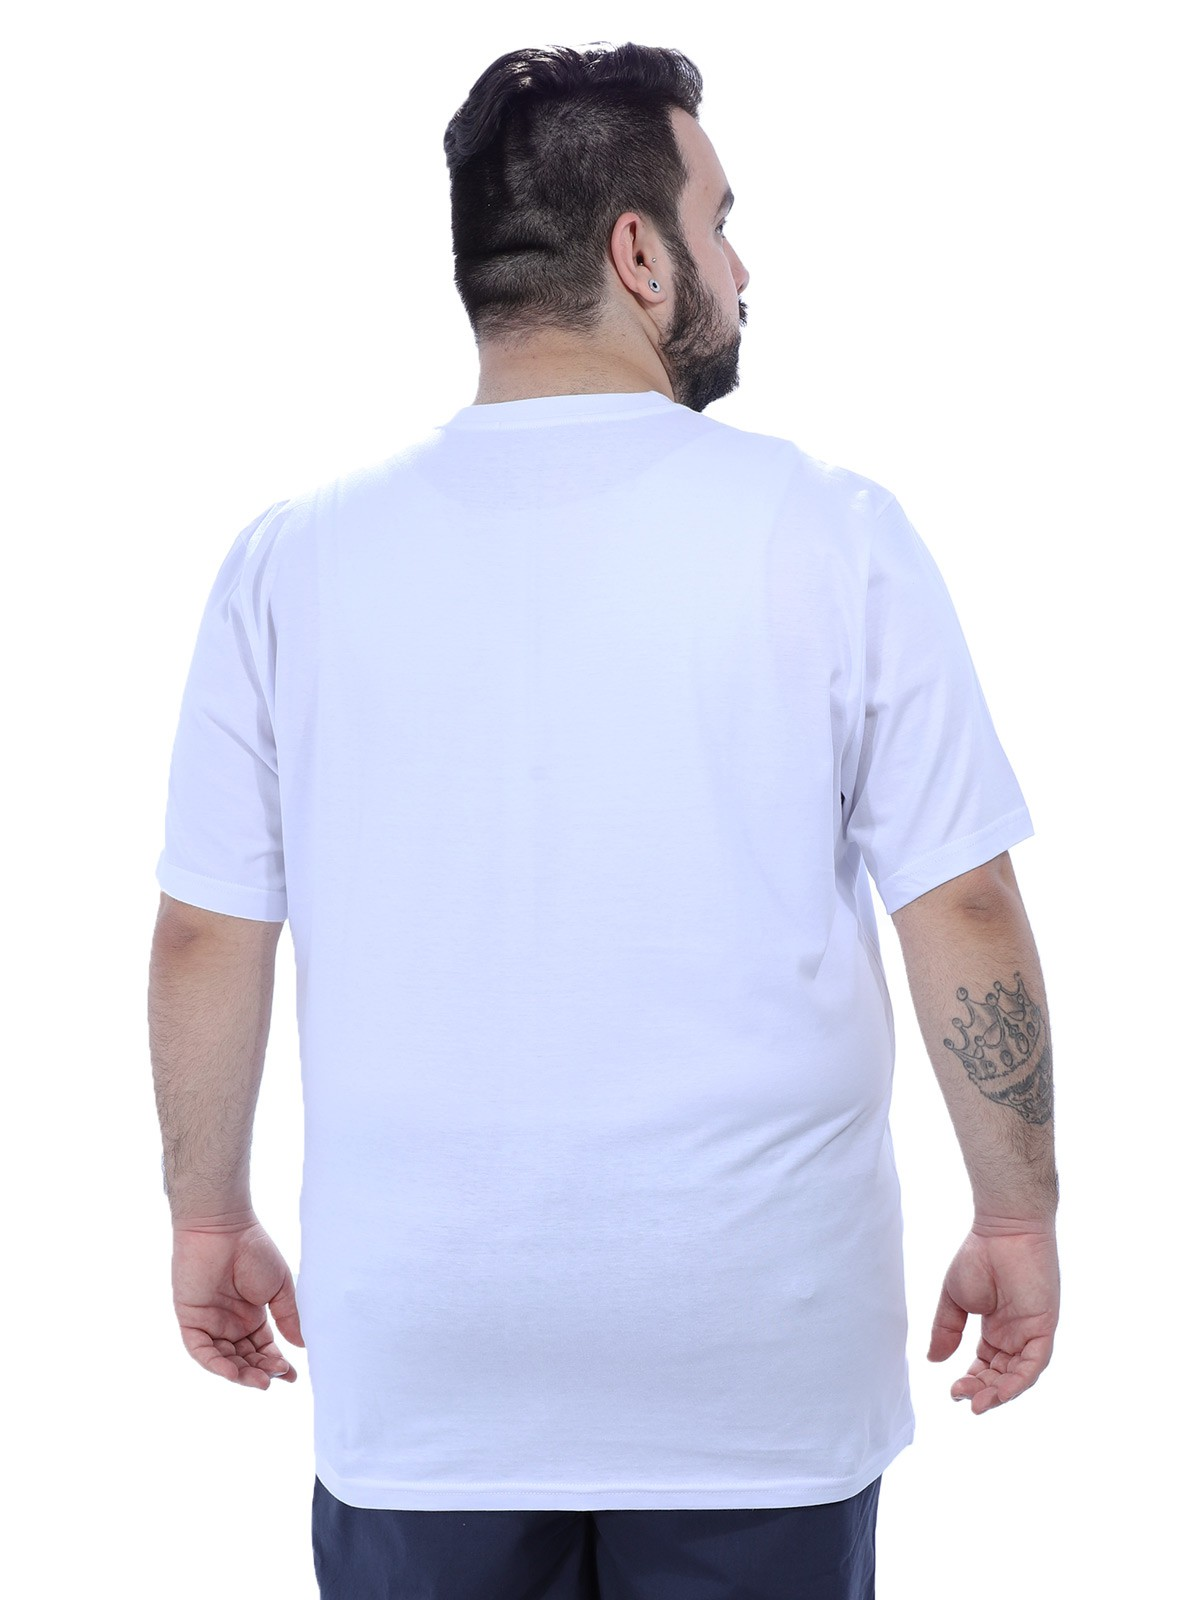 Camiseta Plus Size Masculino Lisa Branca